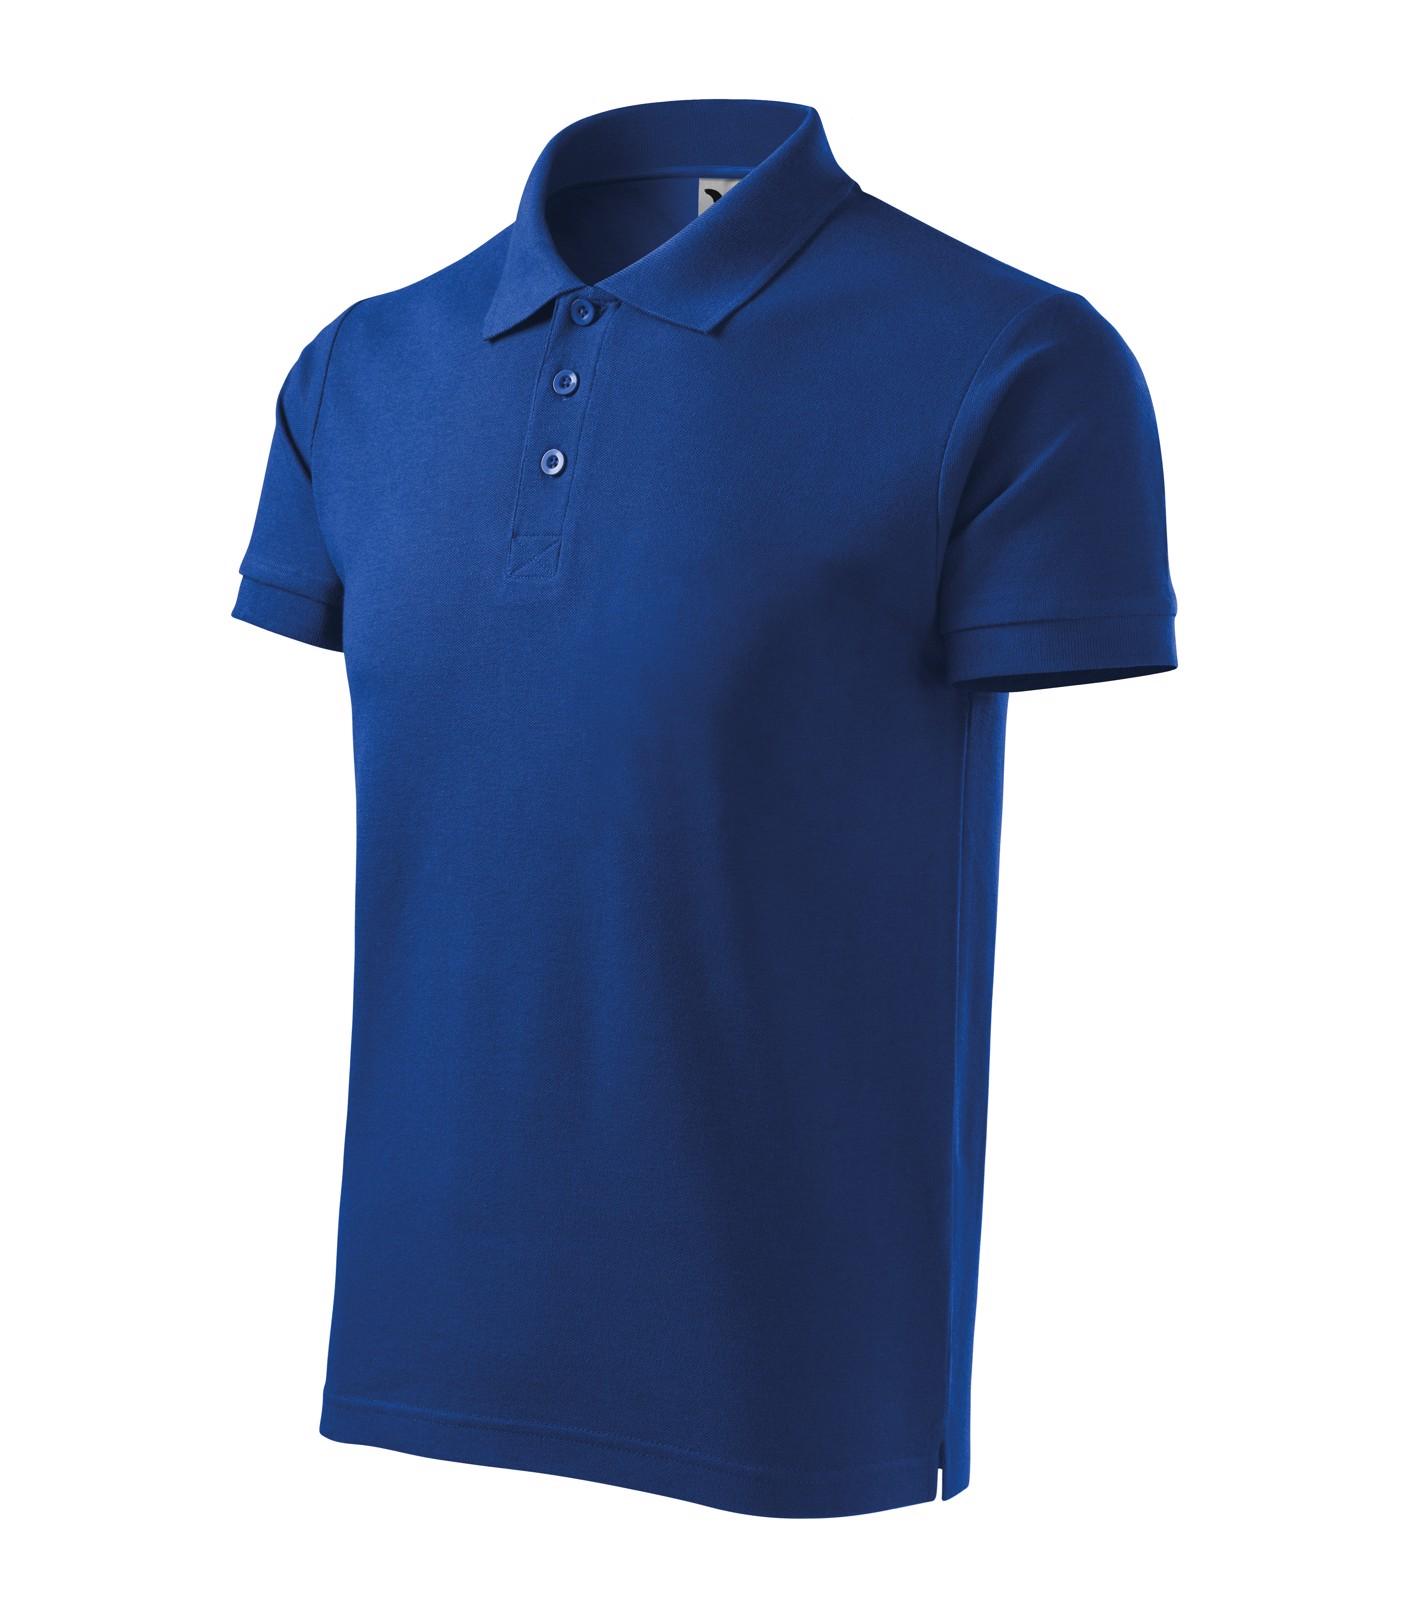 Polo Shirt Gents Malfini Cotton Heavy - Royal Blue / S